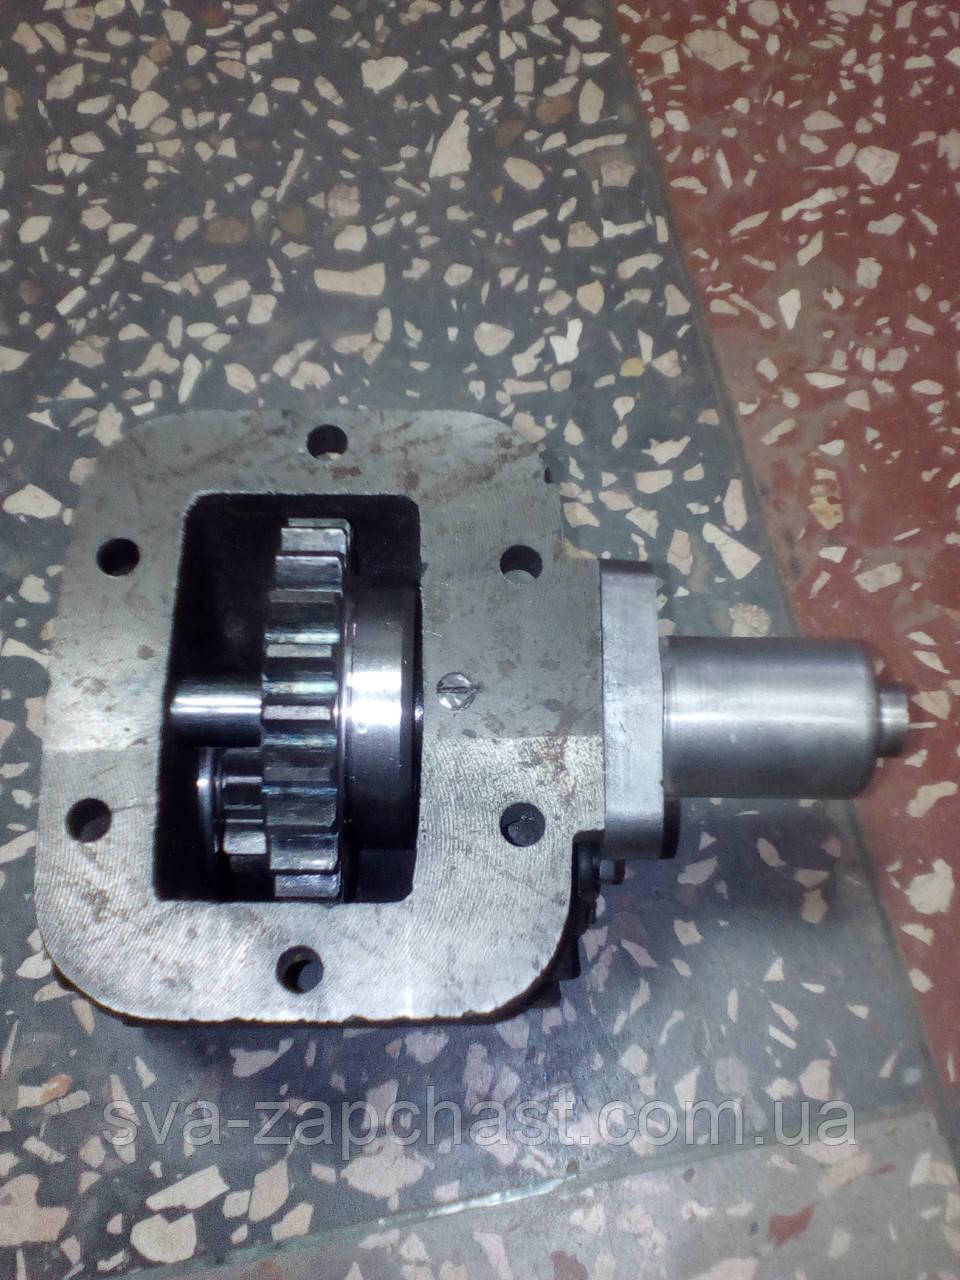 Коробка отбора мощности (КОМ) ГАЗ-3309 пневмопривод - СВА-Запчасть в Мелитополе